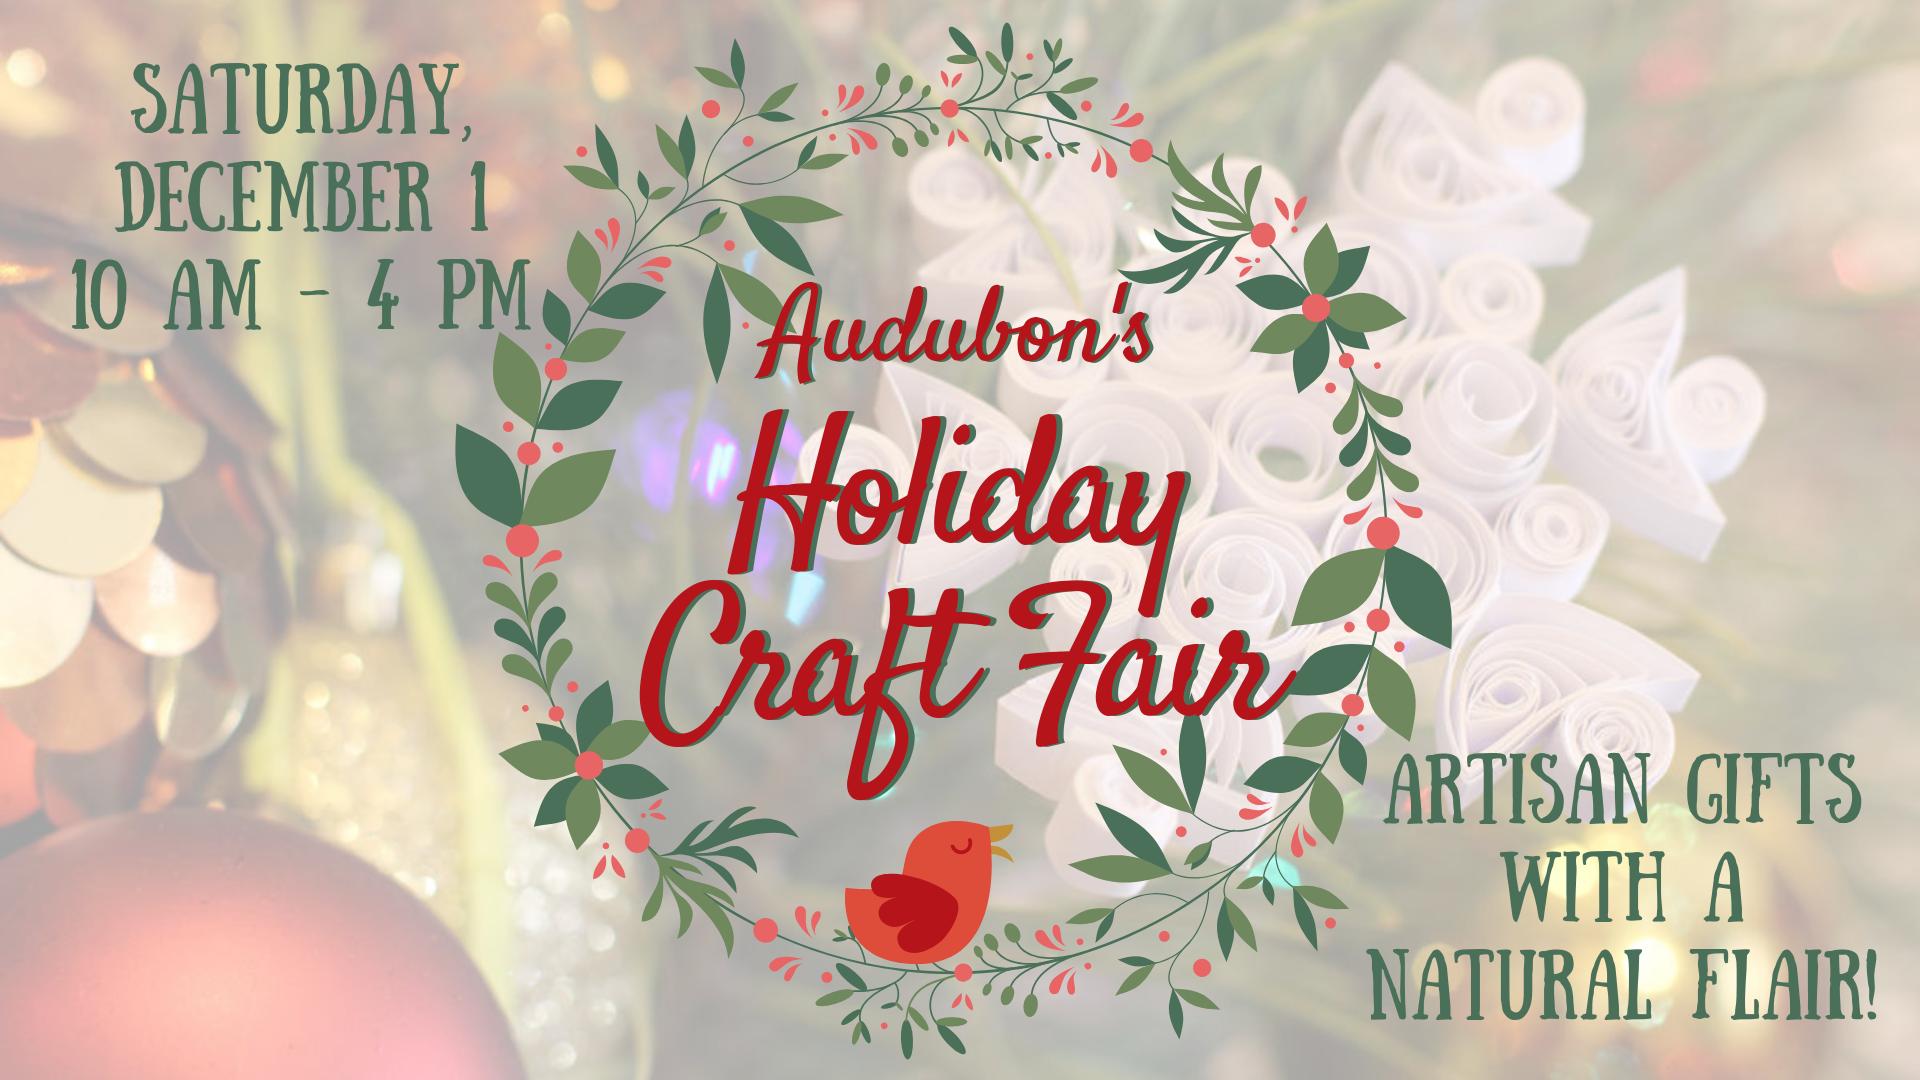 Audubon Holiday Craft Fair